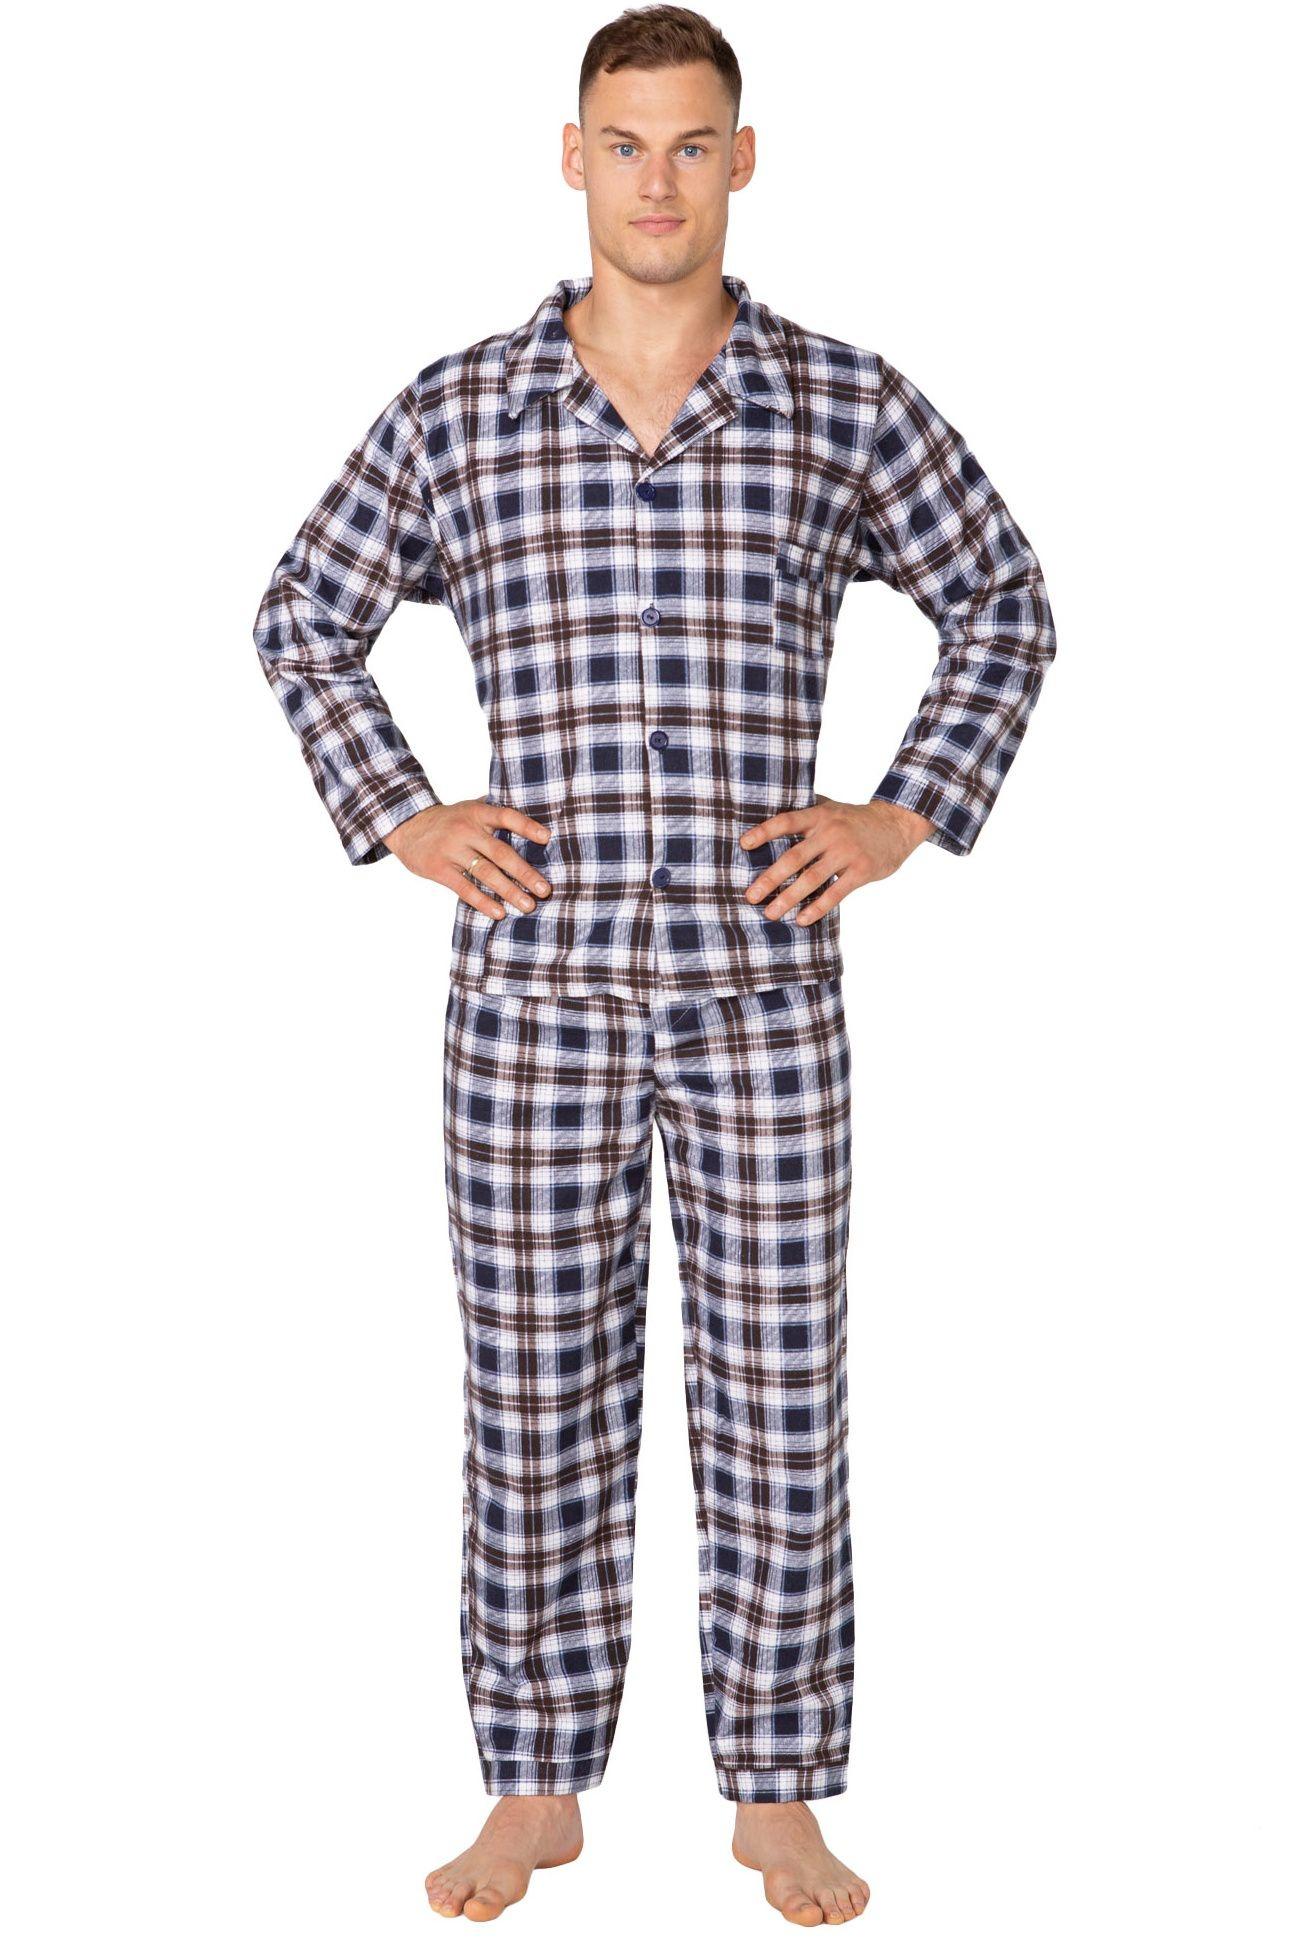 17778b34f67f Pánské flanelové pyžamo Radek kárované - ELEGANT.cz